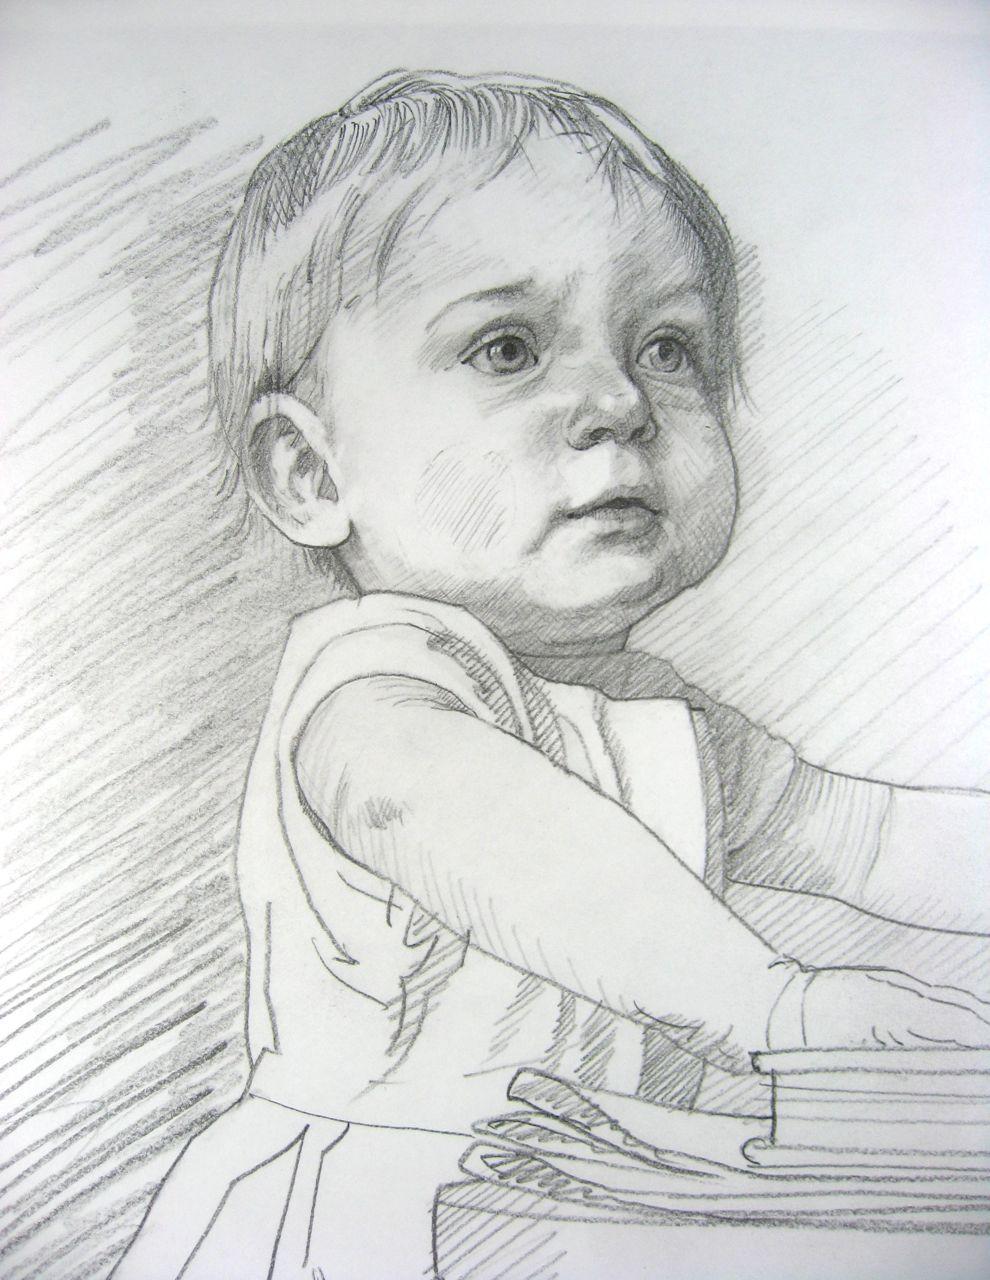 'Hadley' sketch for portrait.